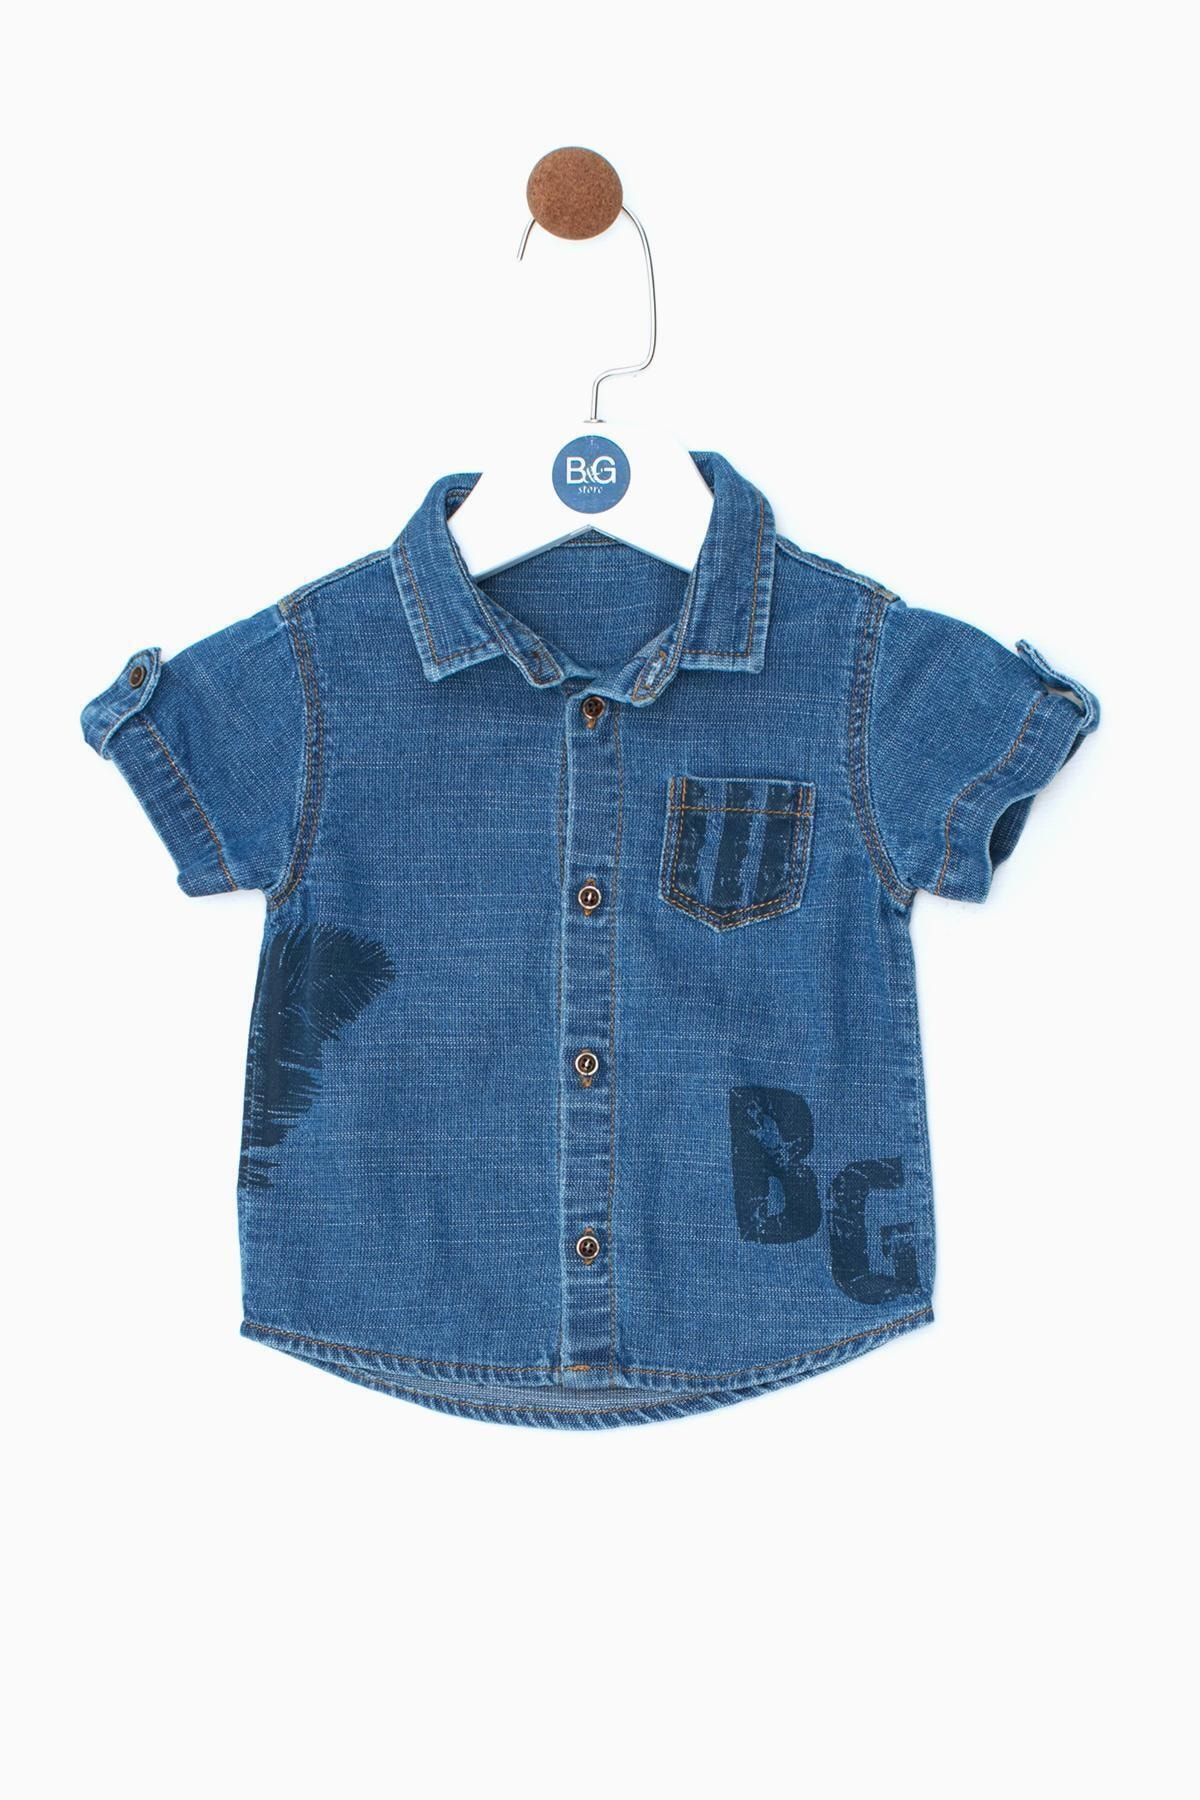 BG Baby Erkek Bebek Jean Gömlek 19ss0bg1601 1